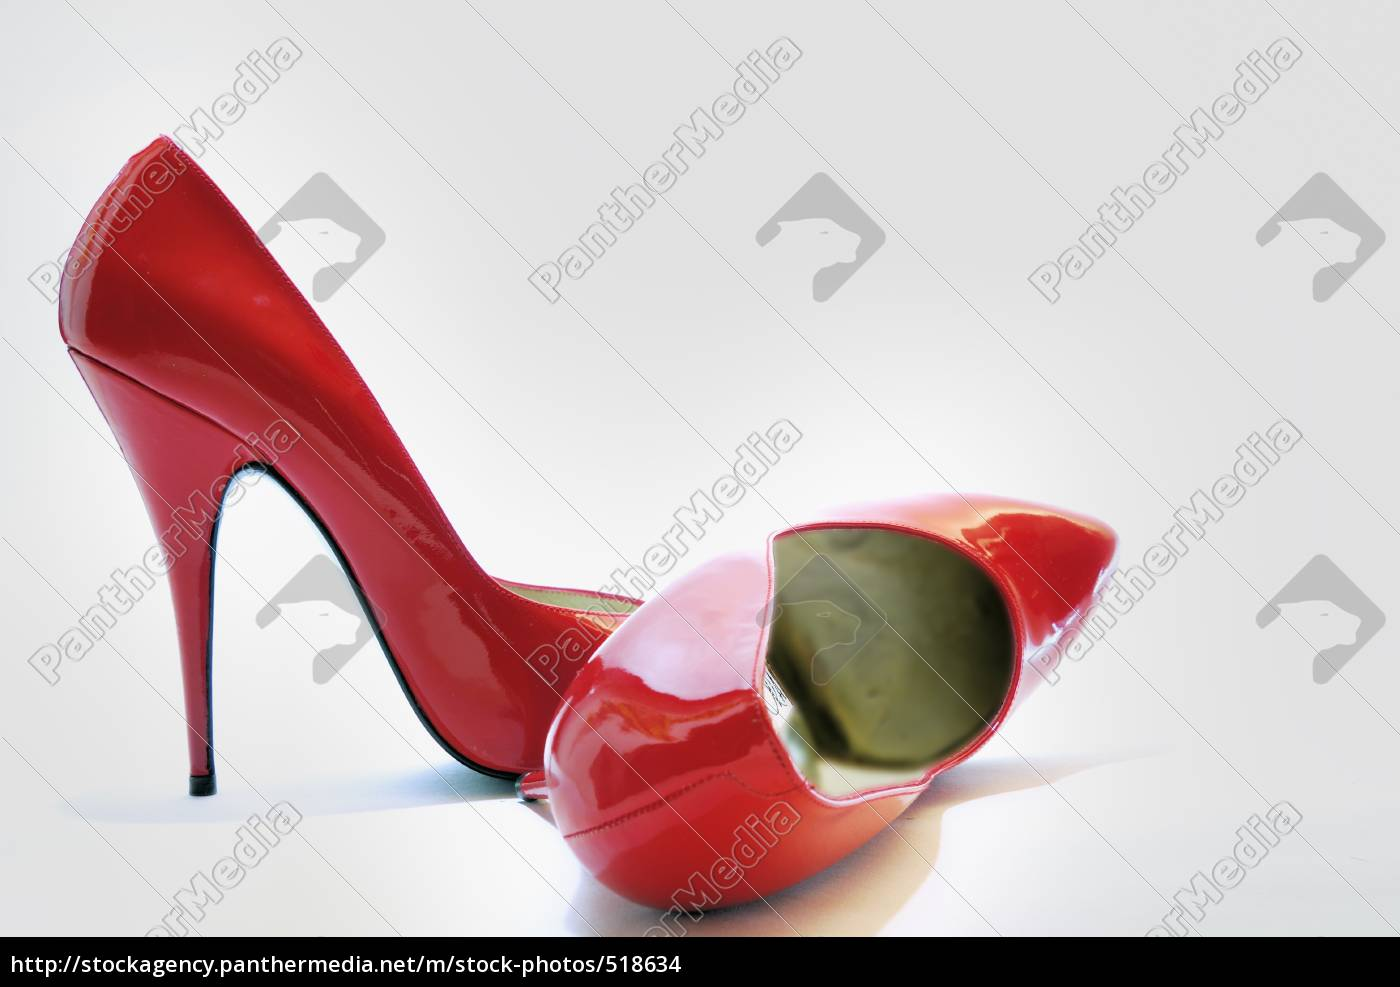 red, high, heels - 518634